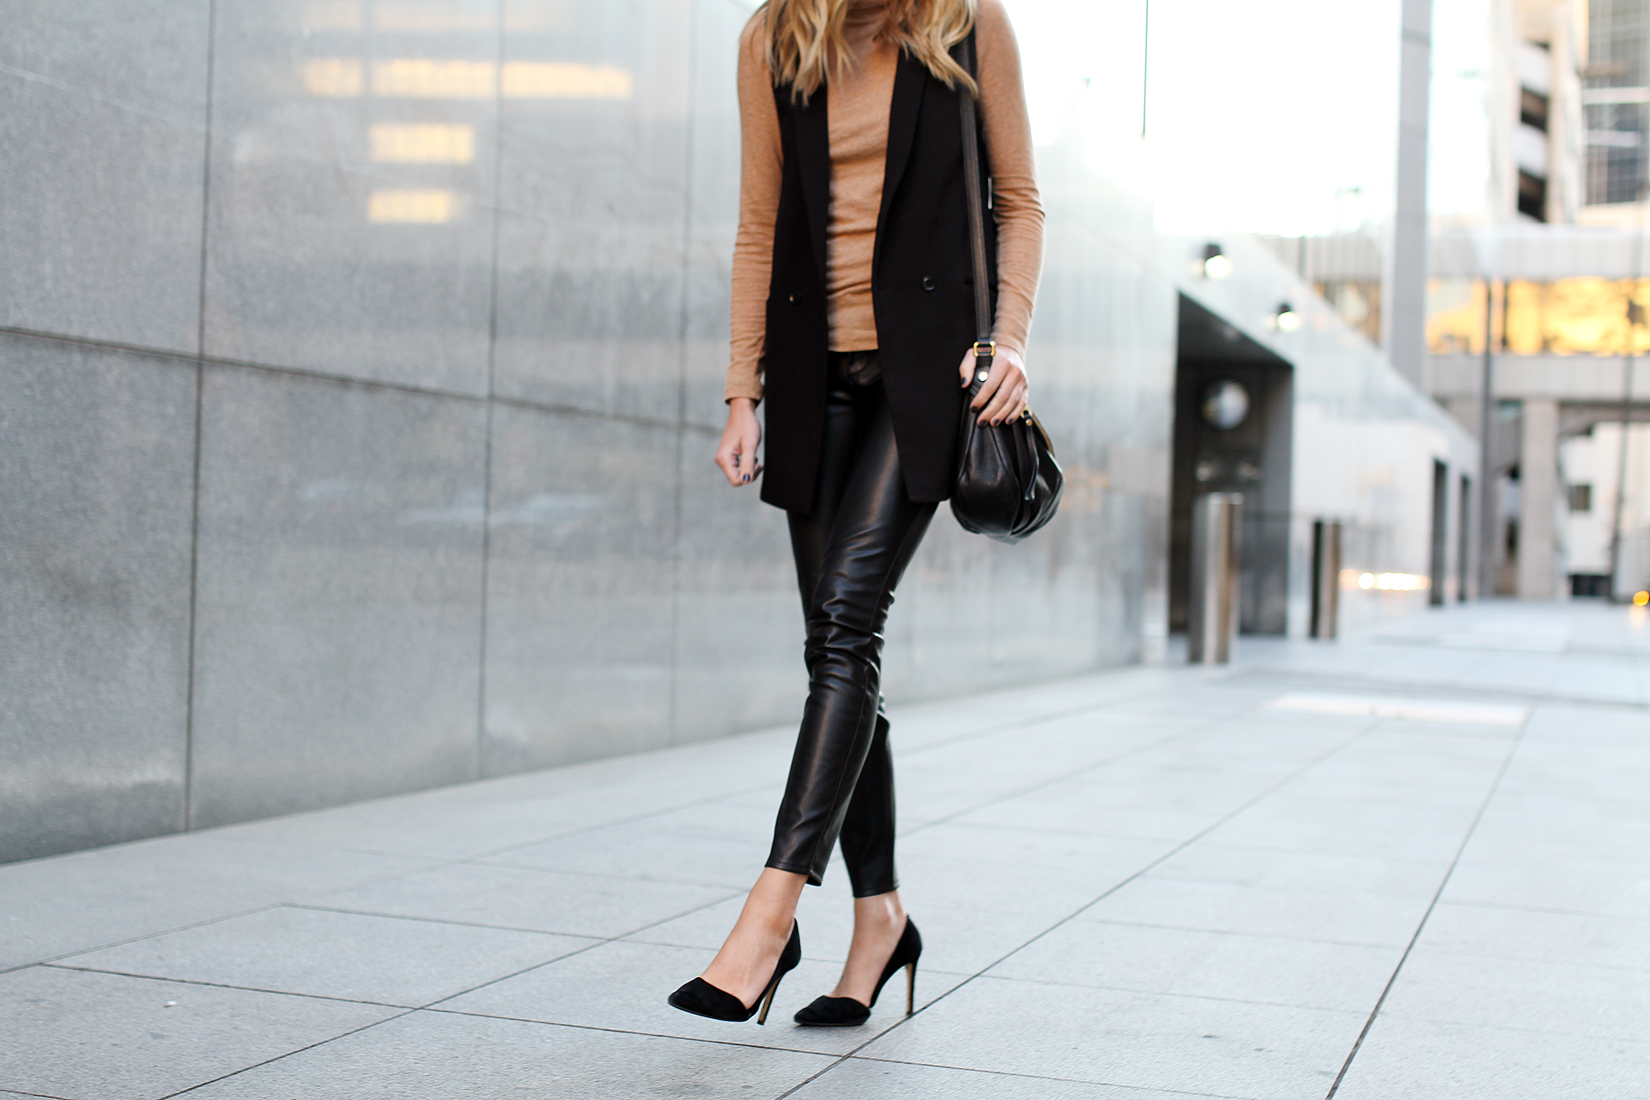 fashion-jackson-black-long-vest-camel-turtleneck-black-faux-leather-skinny-pants-black-suede-pumps